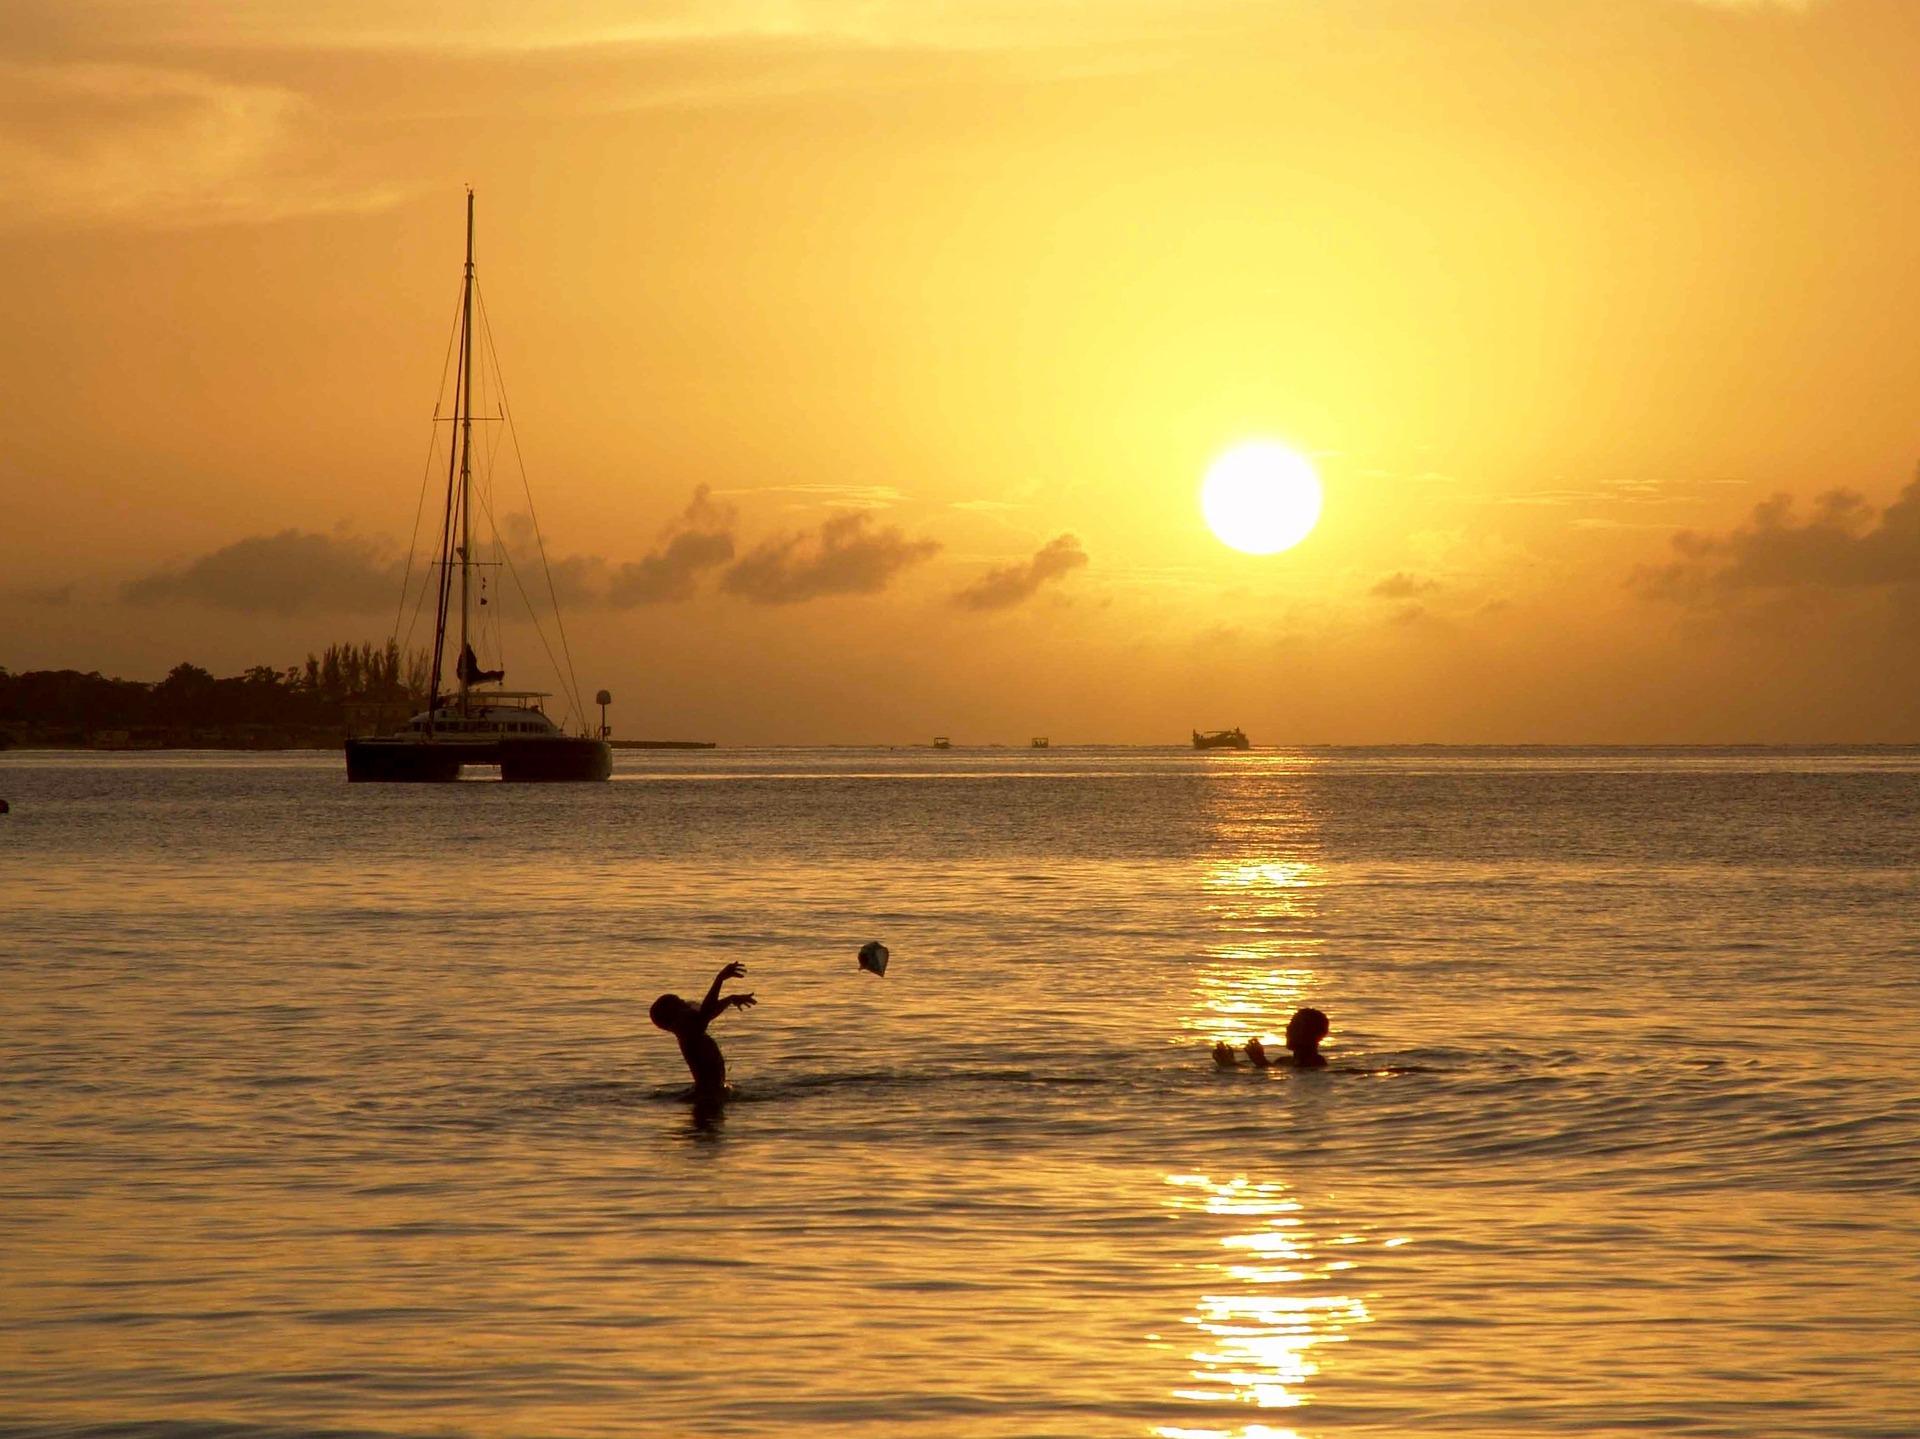 Sonnenuntergang in Jamaica